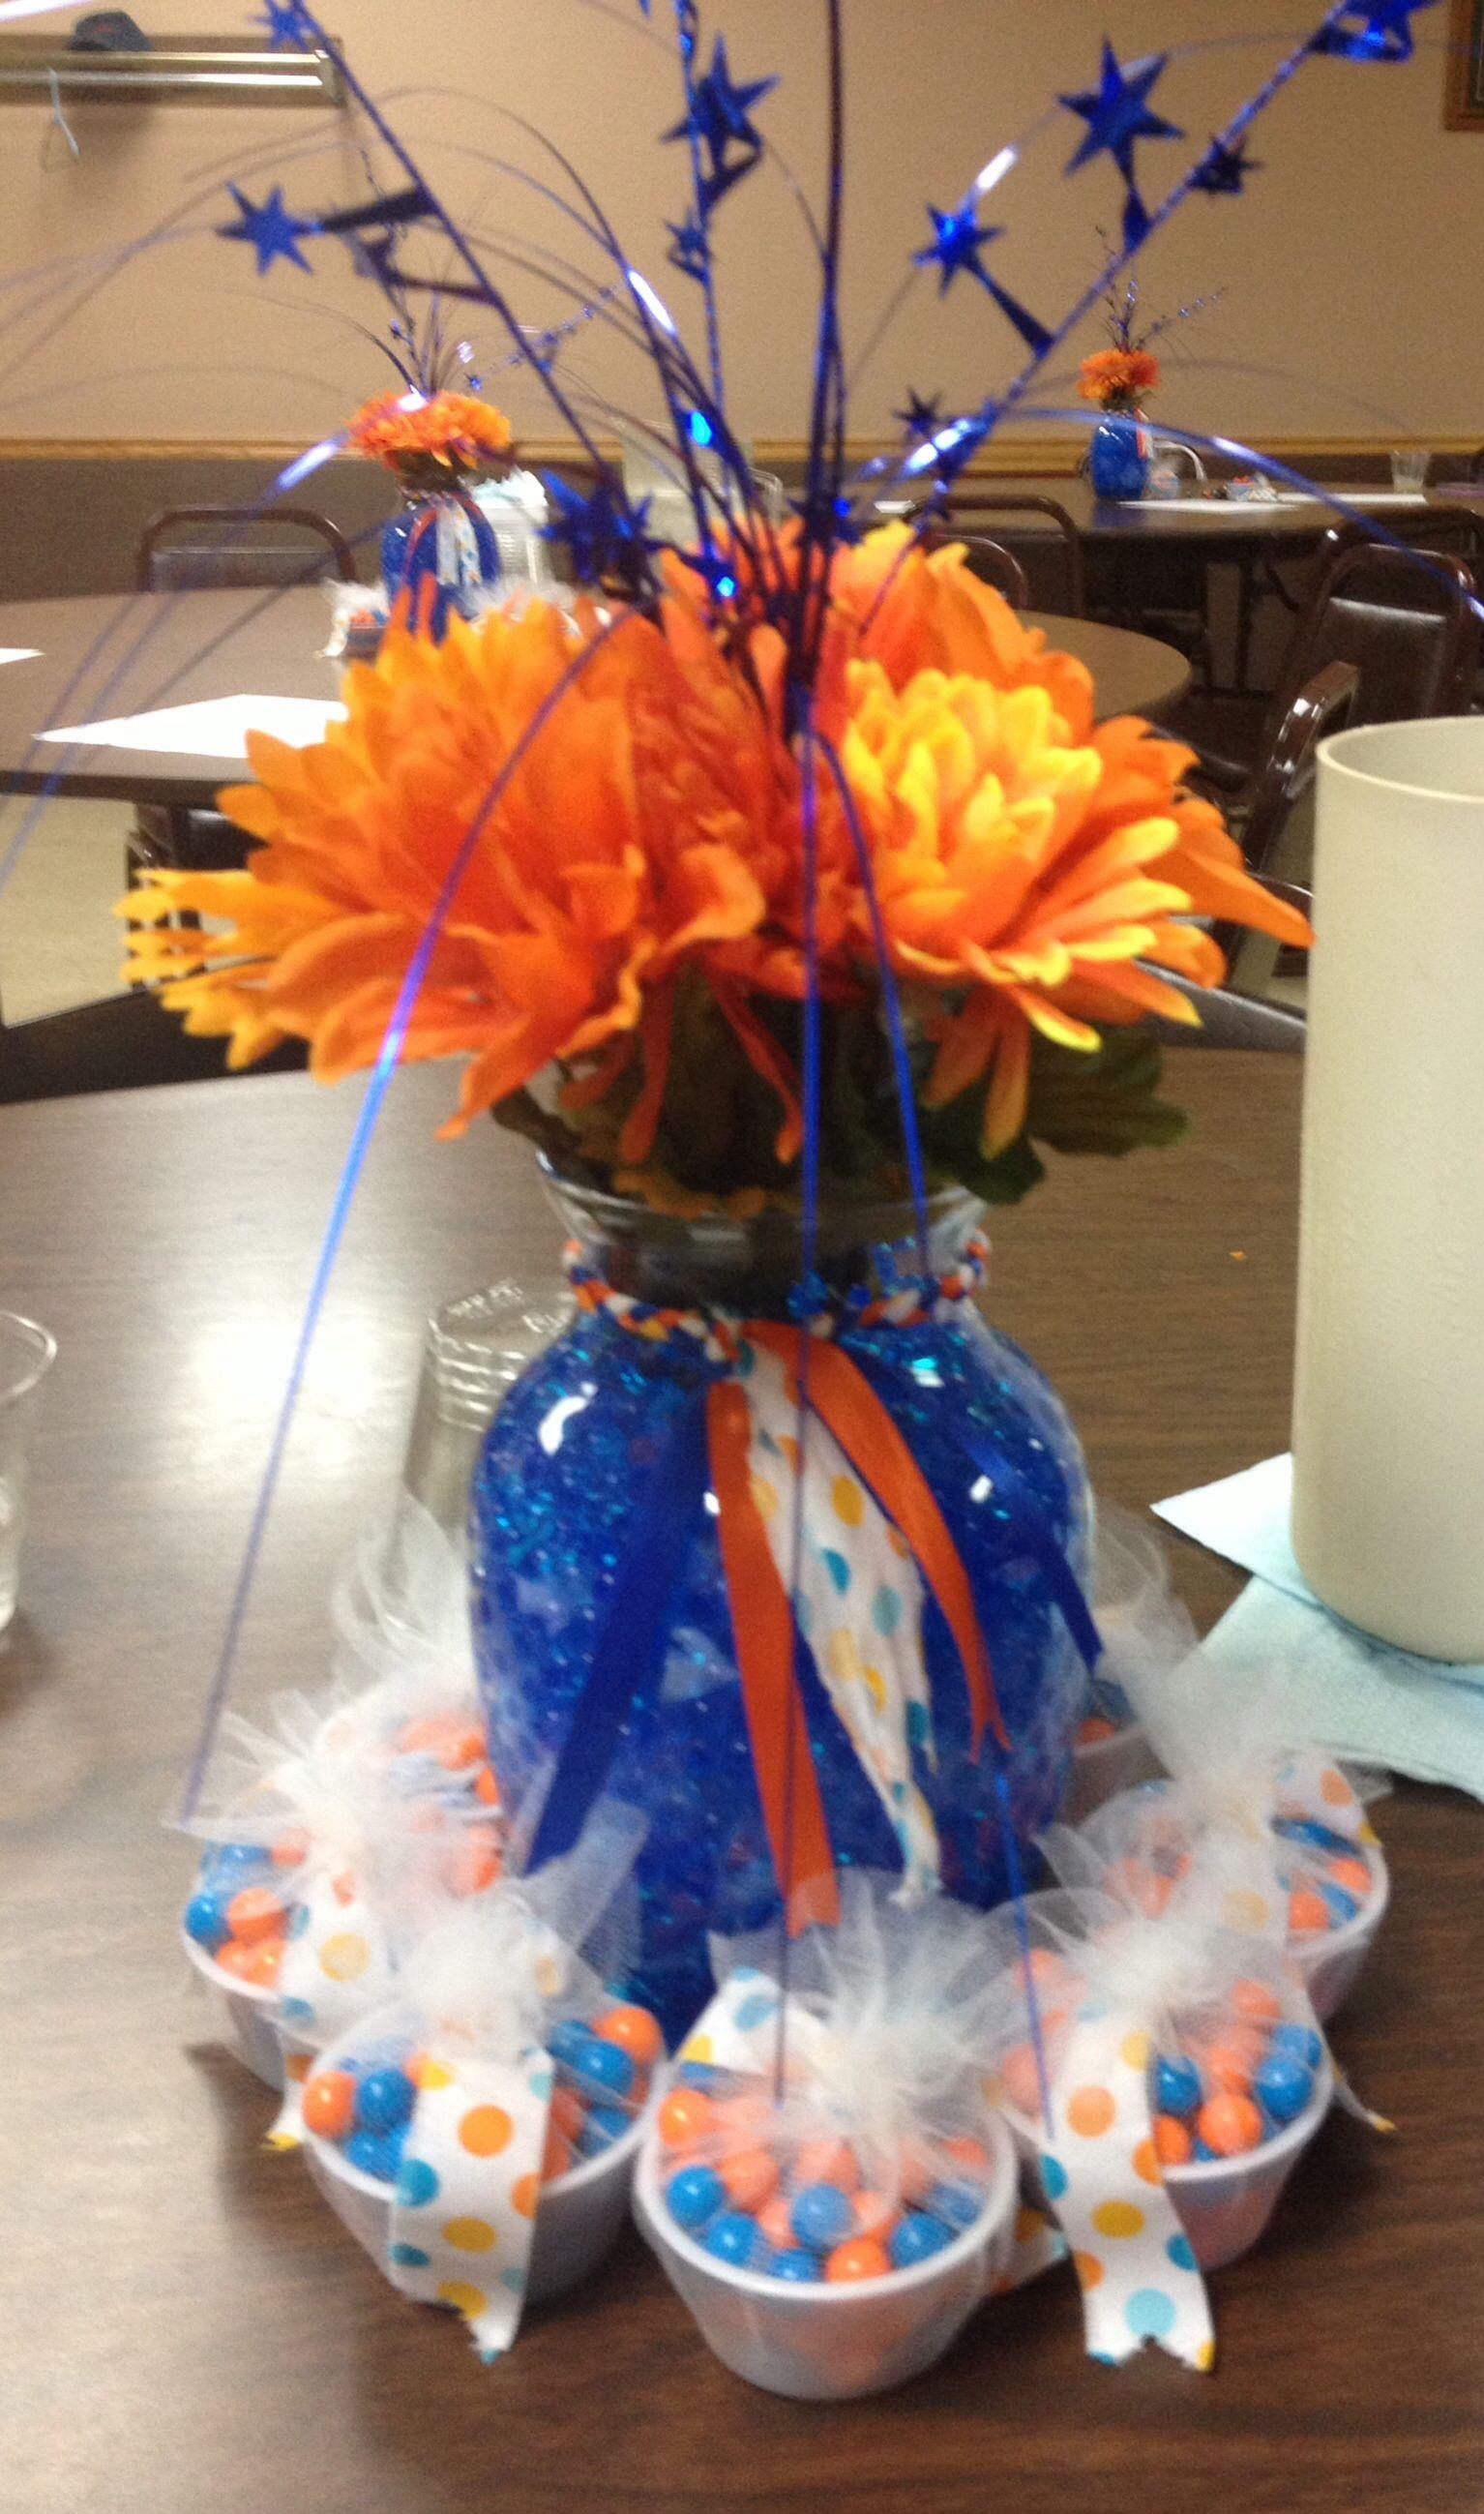 Wedding Decorations Blue And Orange : Royal blue and orange bridal shower centerpieces